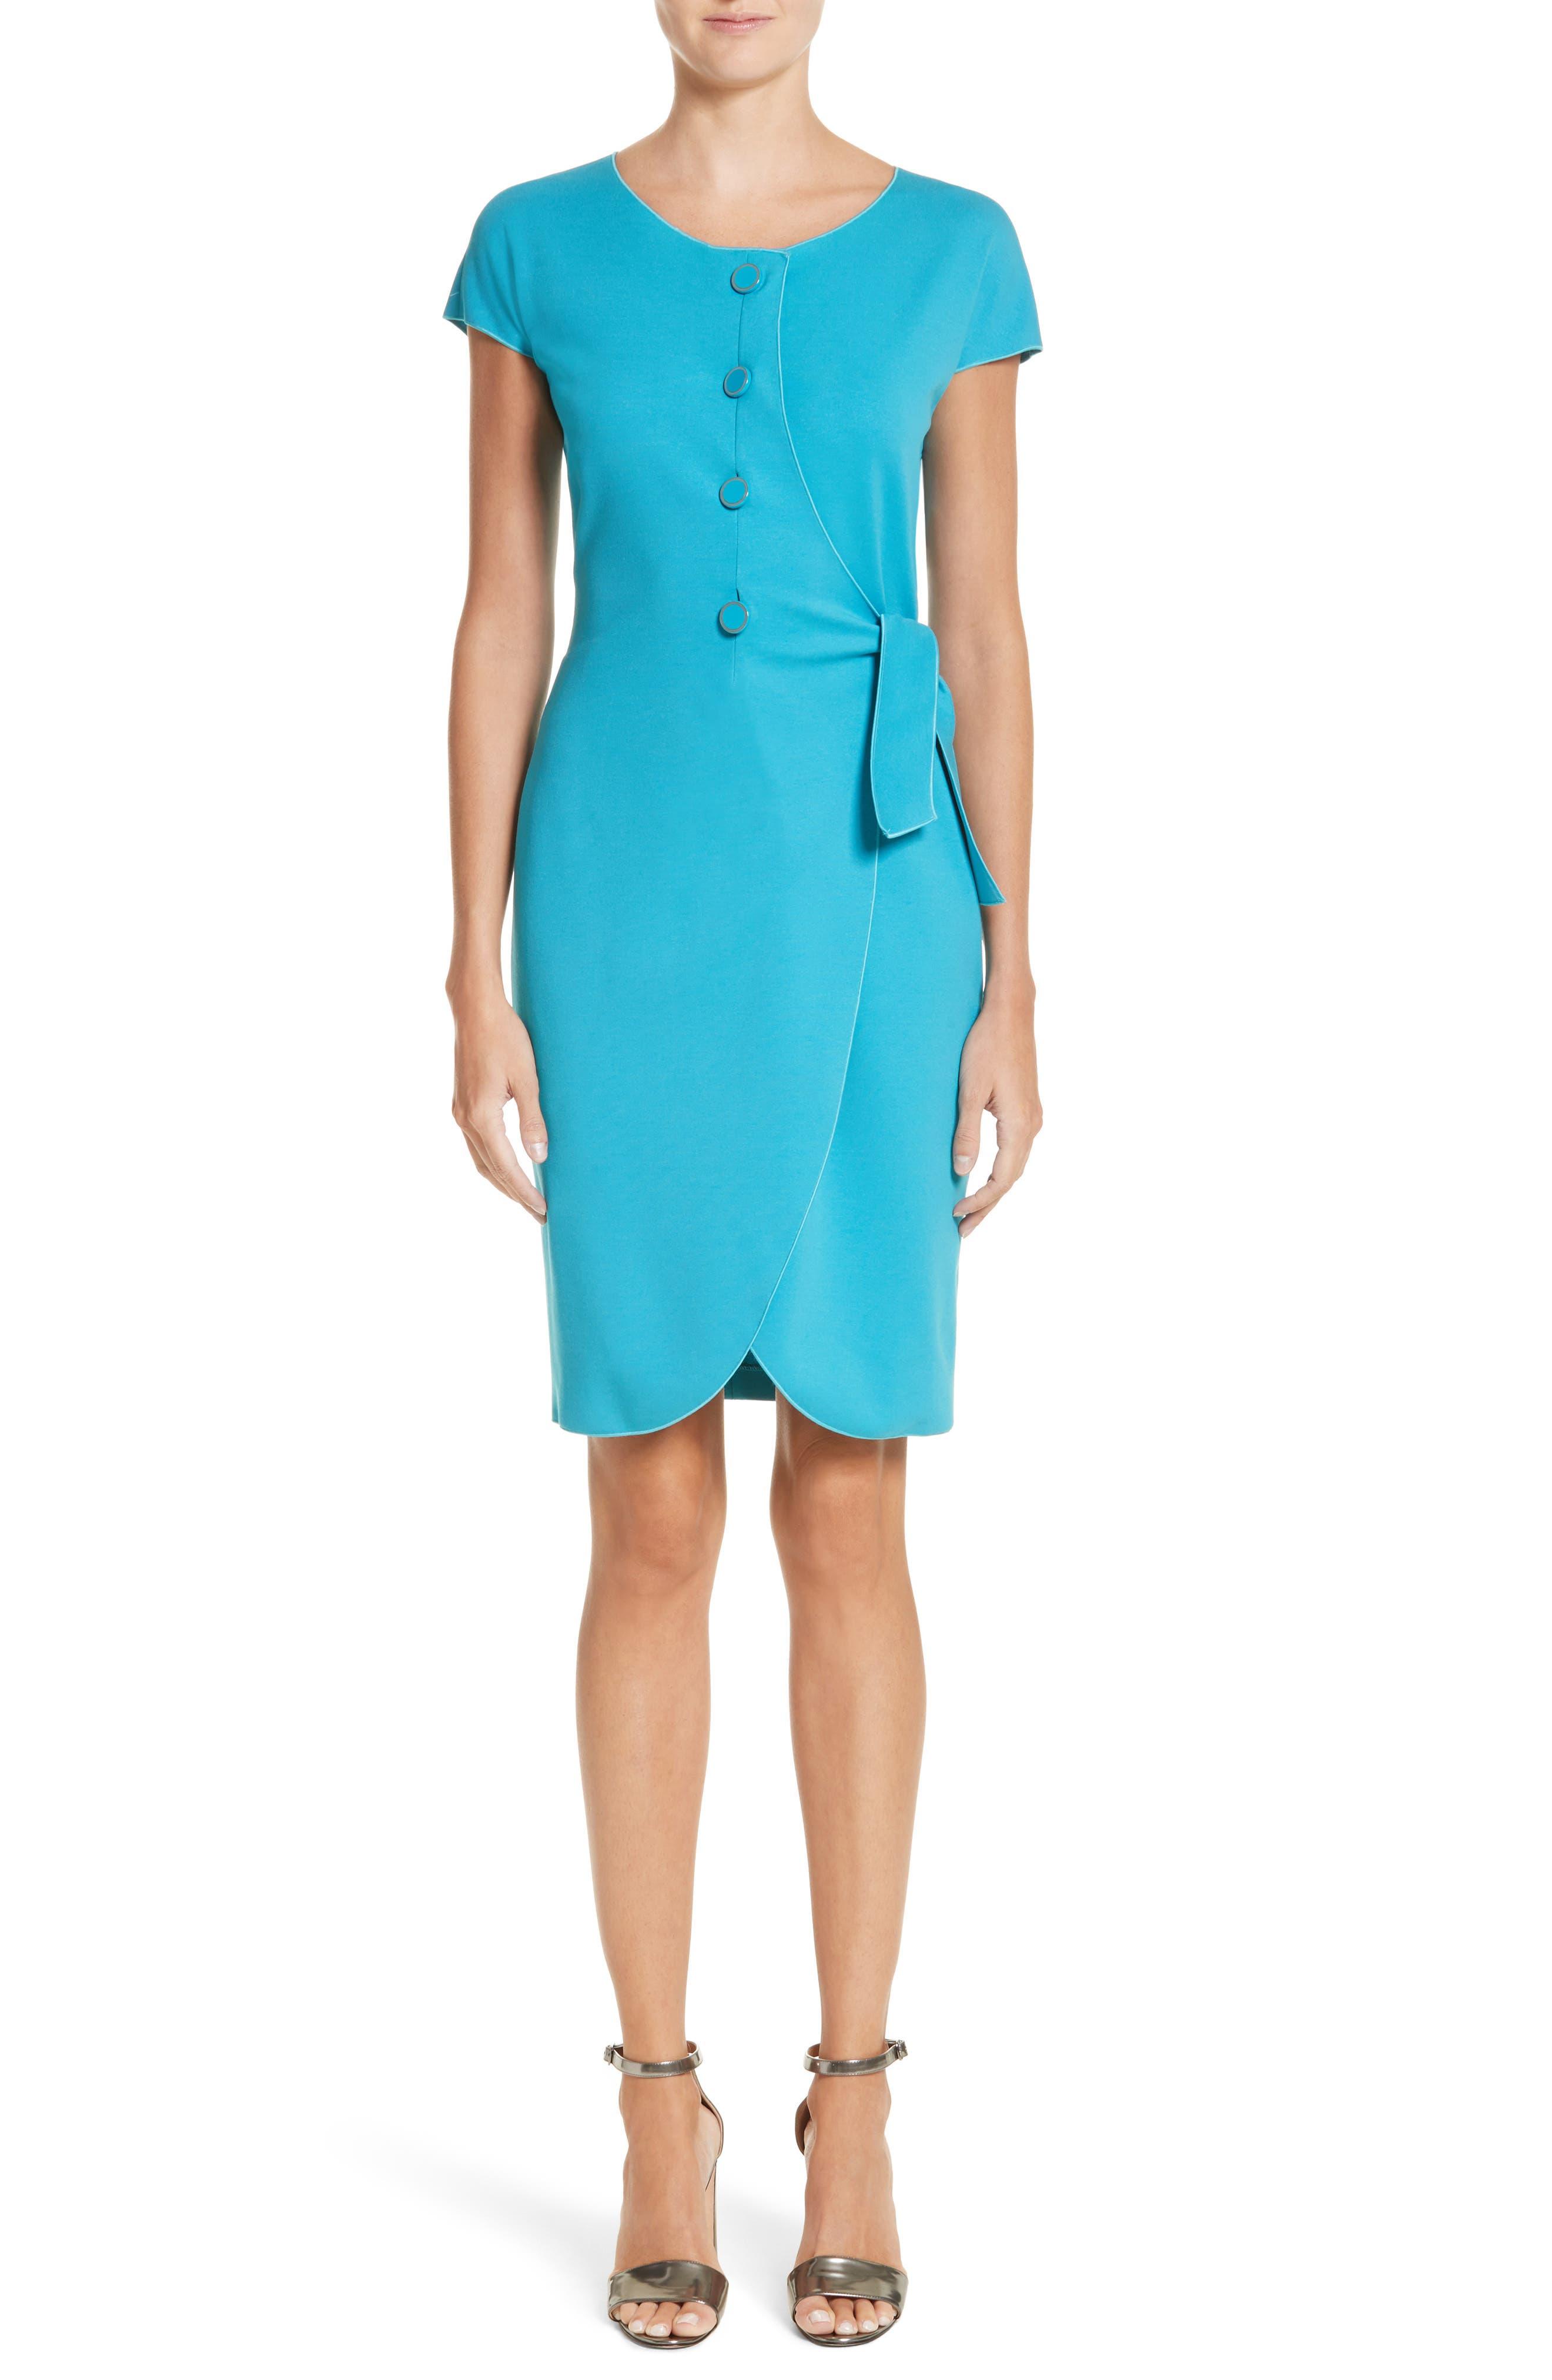 Main Image - Emporio Armani Knotted Wrap Skirt Dress